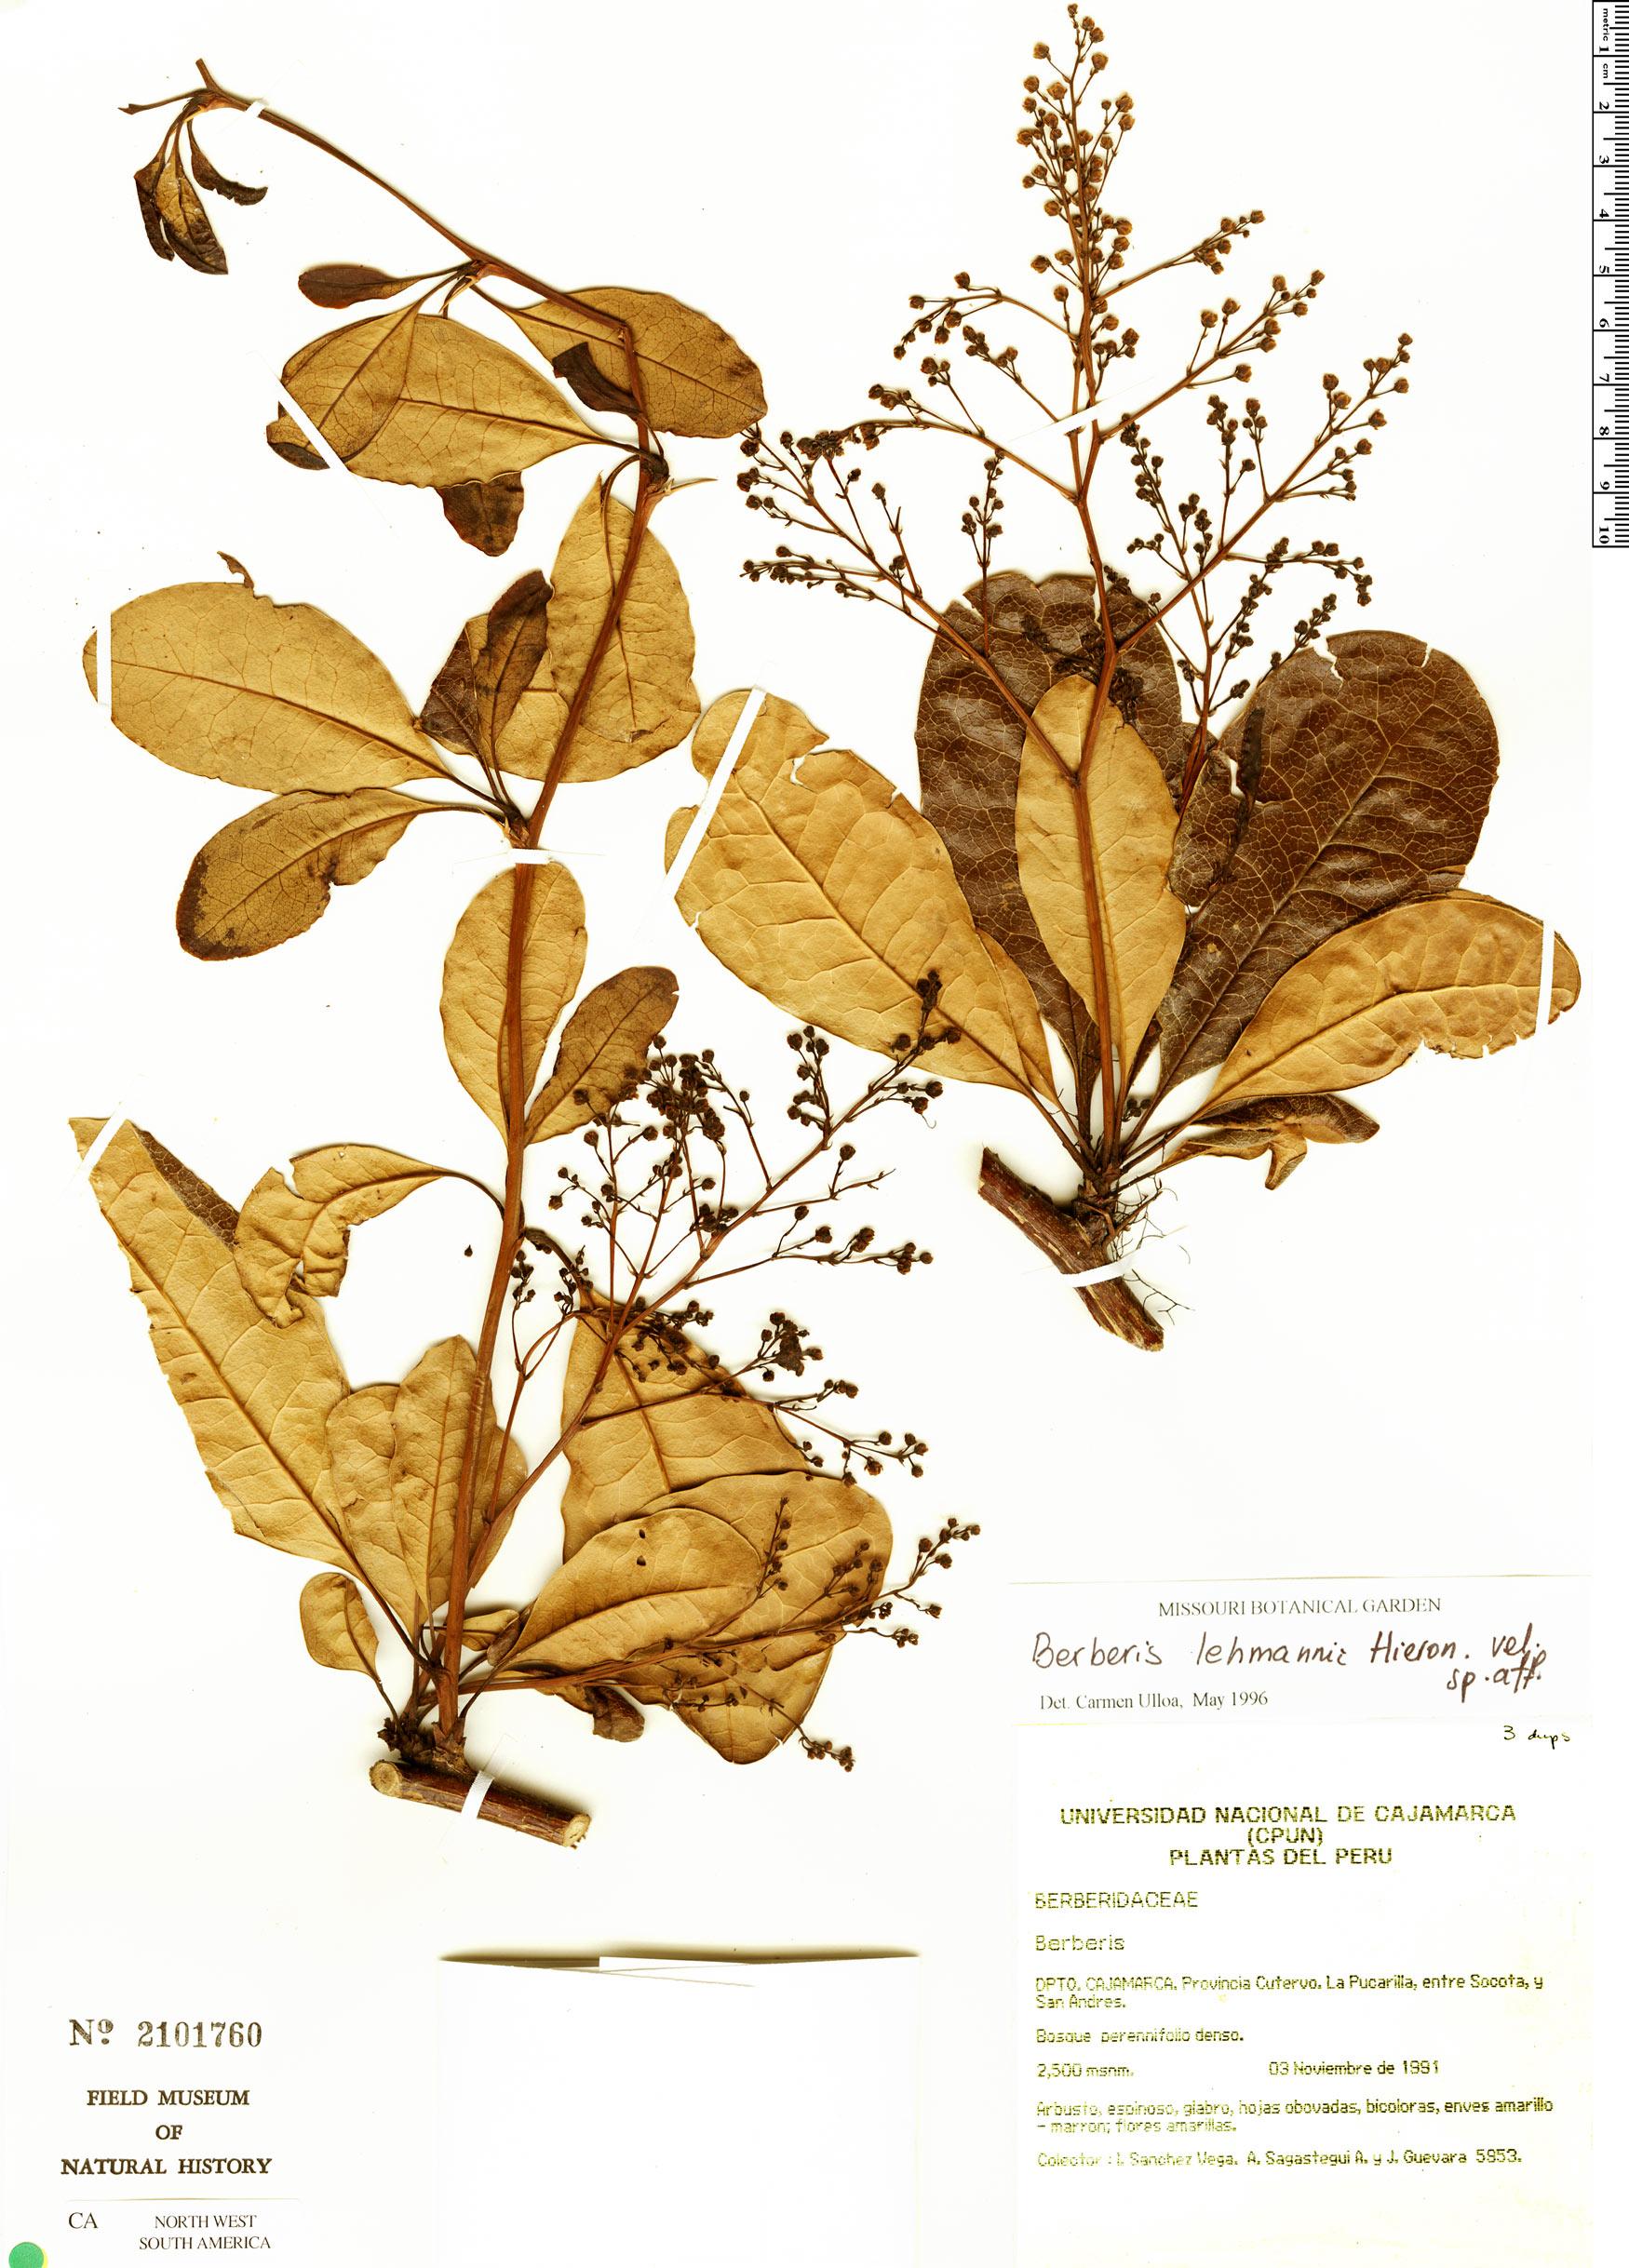 Specimen: Berberis hochreutineriana